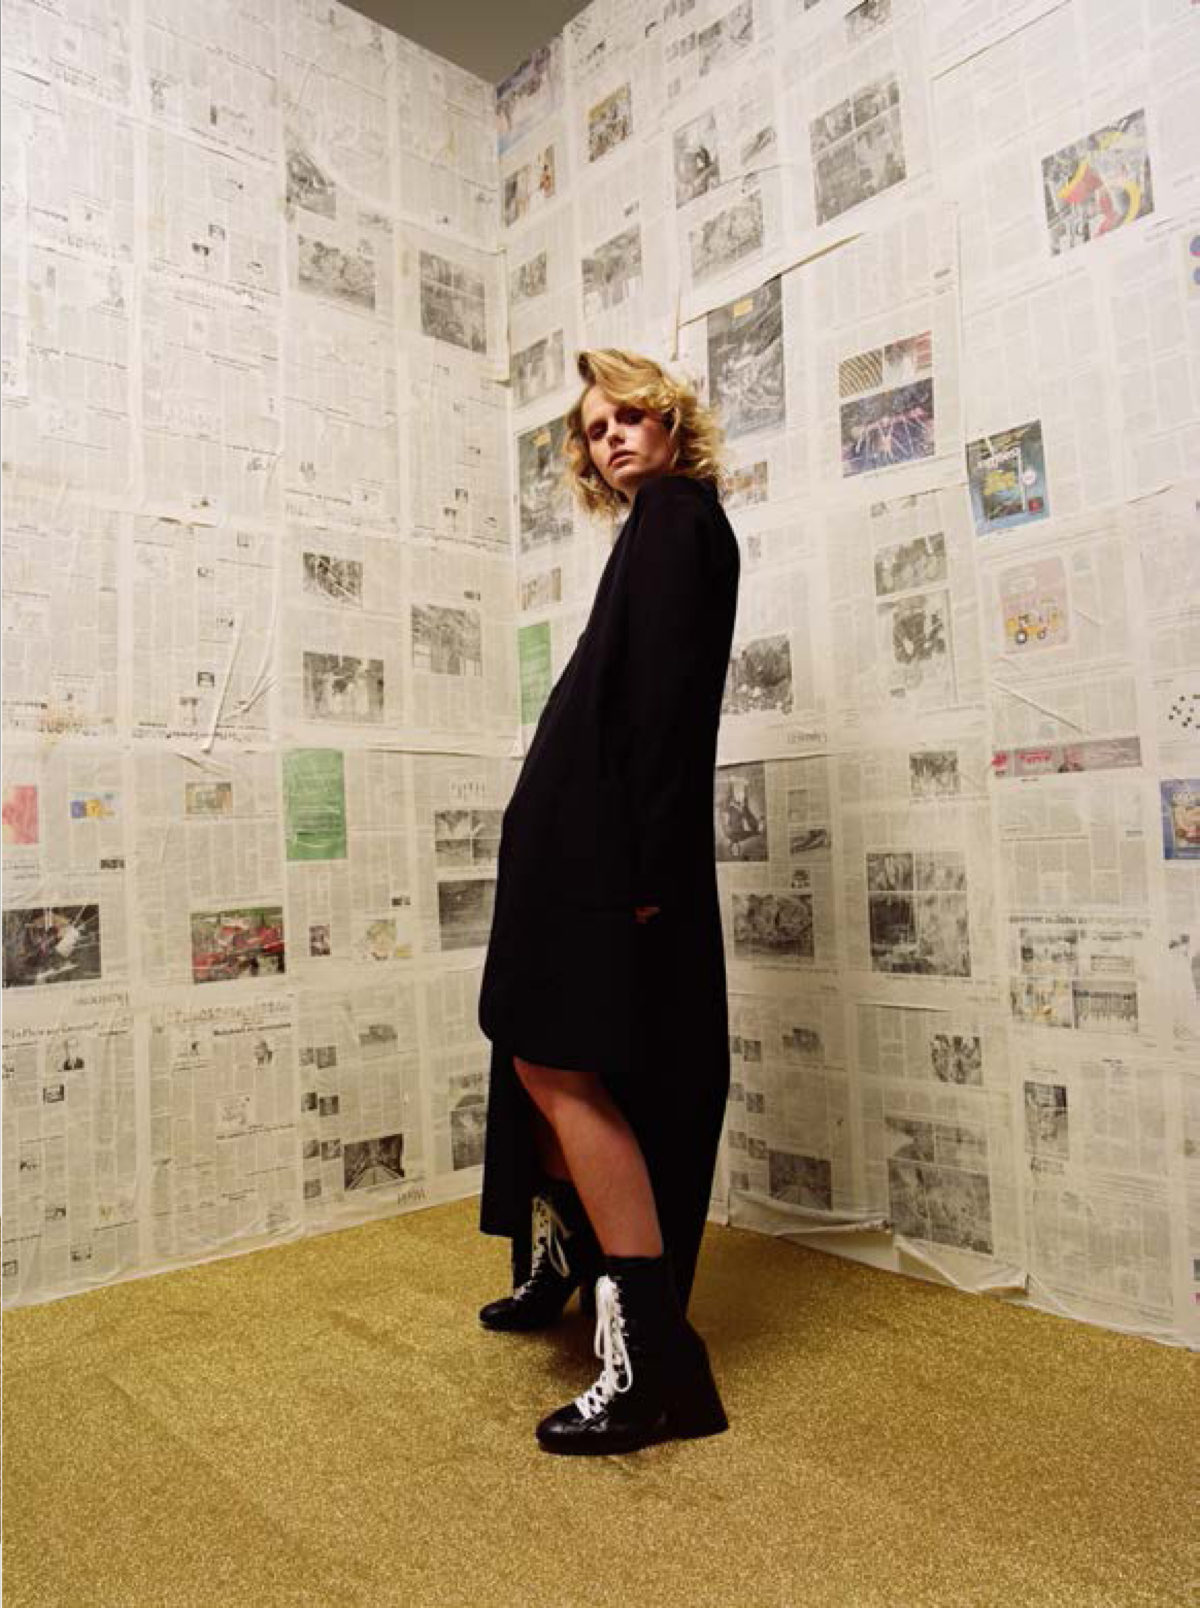 Styled by Arthur Mayadoux with Yohji Yamamoto / Victoria/Tomas